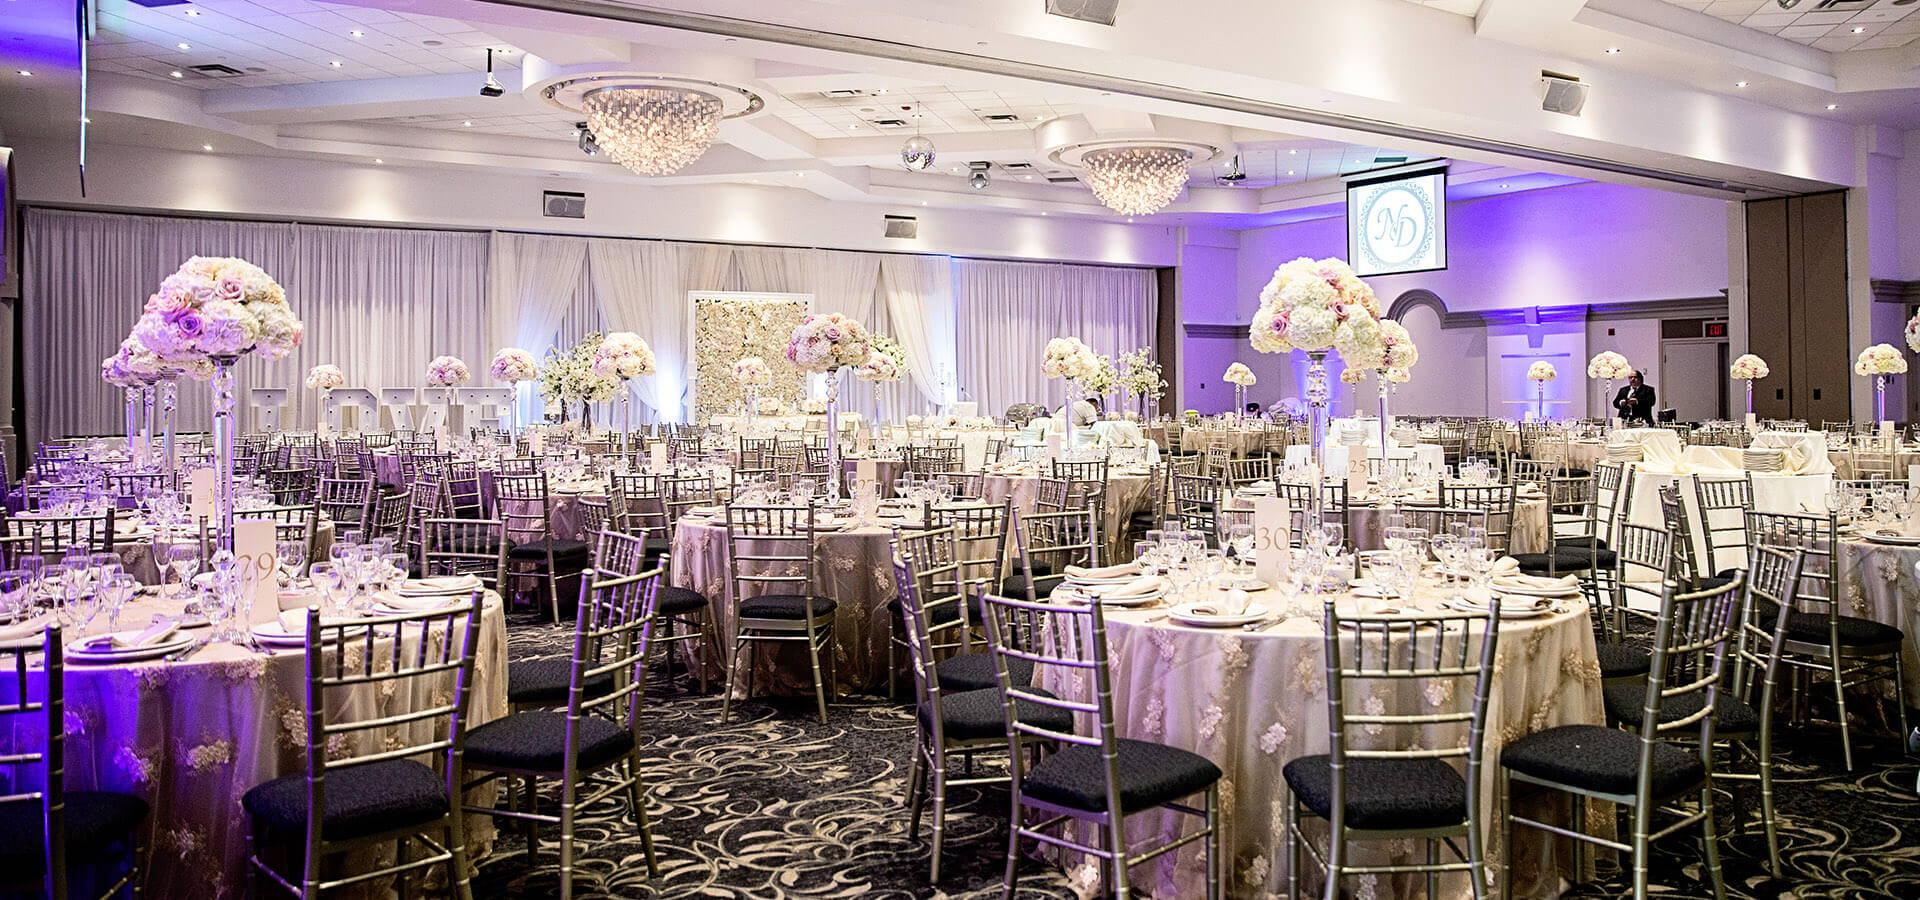 Hero image for Nikki and Daniel's Elegant Wedding at Fontana Primavera Event Centre